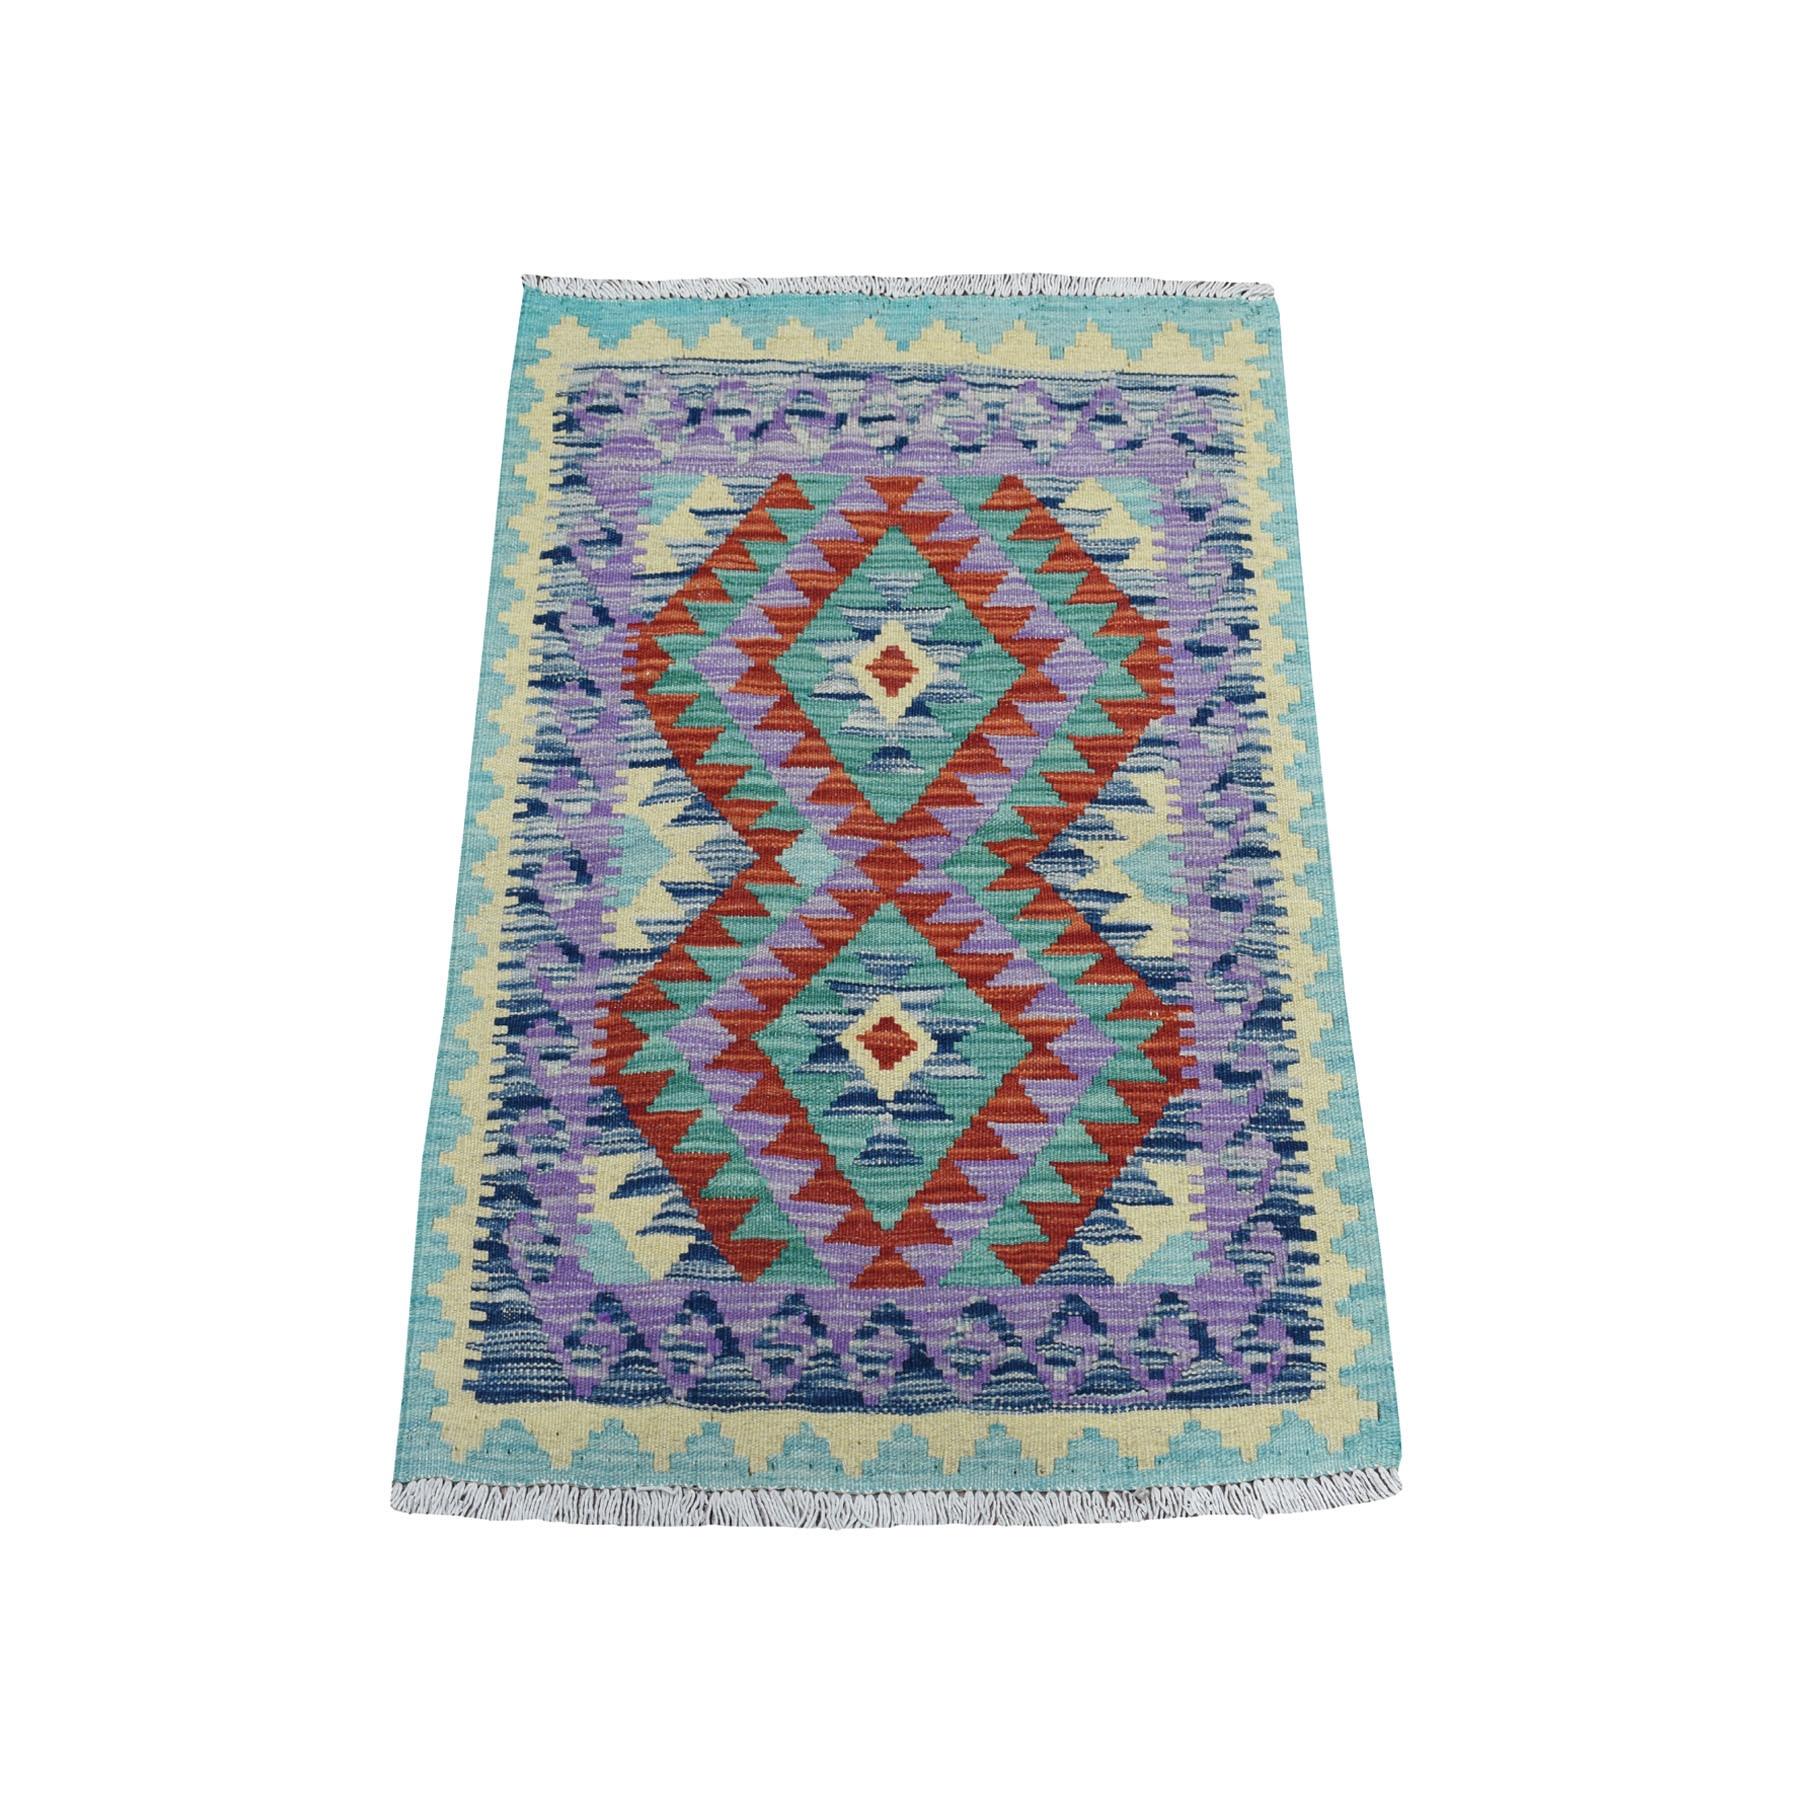 "2'2""X3' Colorful Afghan Kilim Pure Wool Hand Woven Oriental Rug moaea9e8"